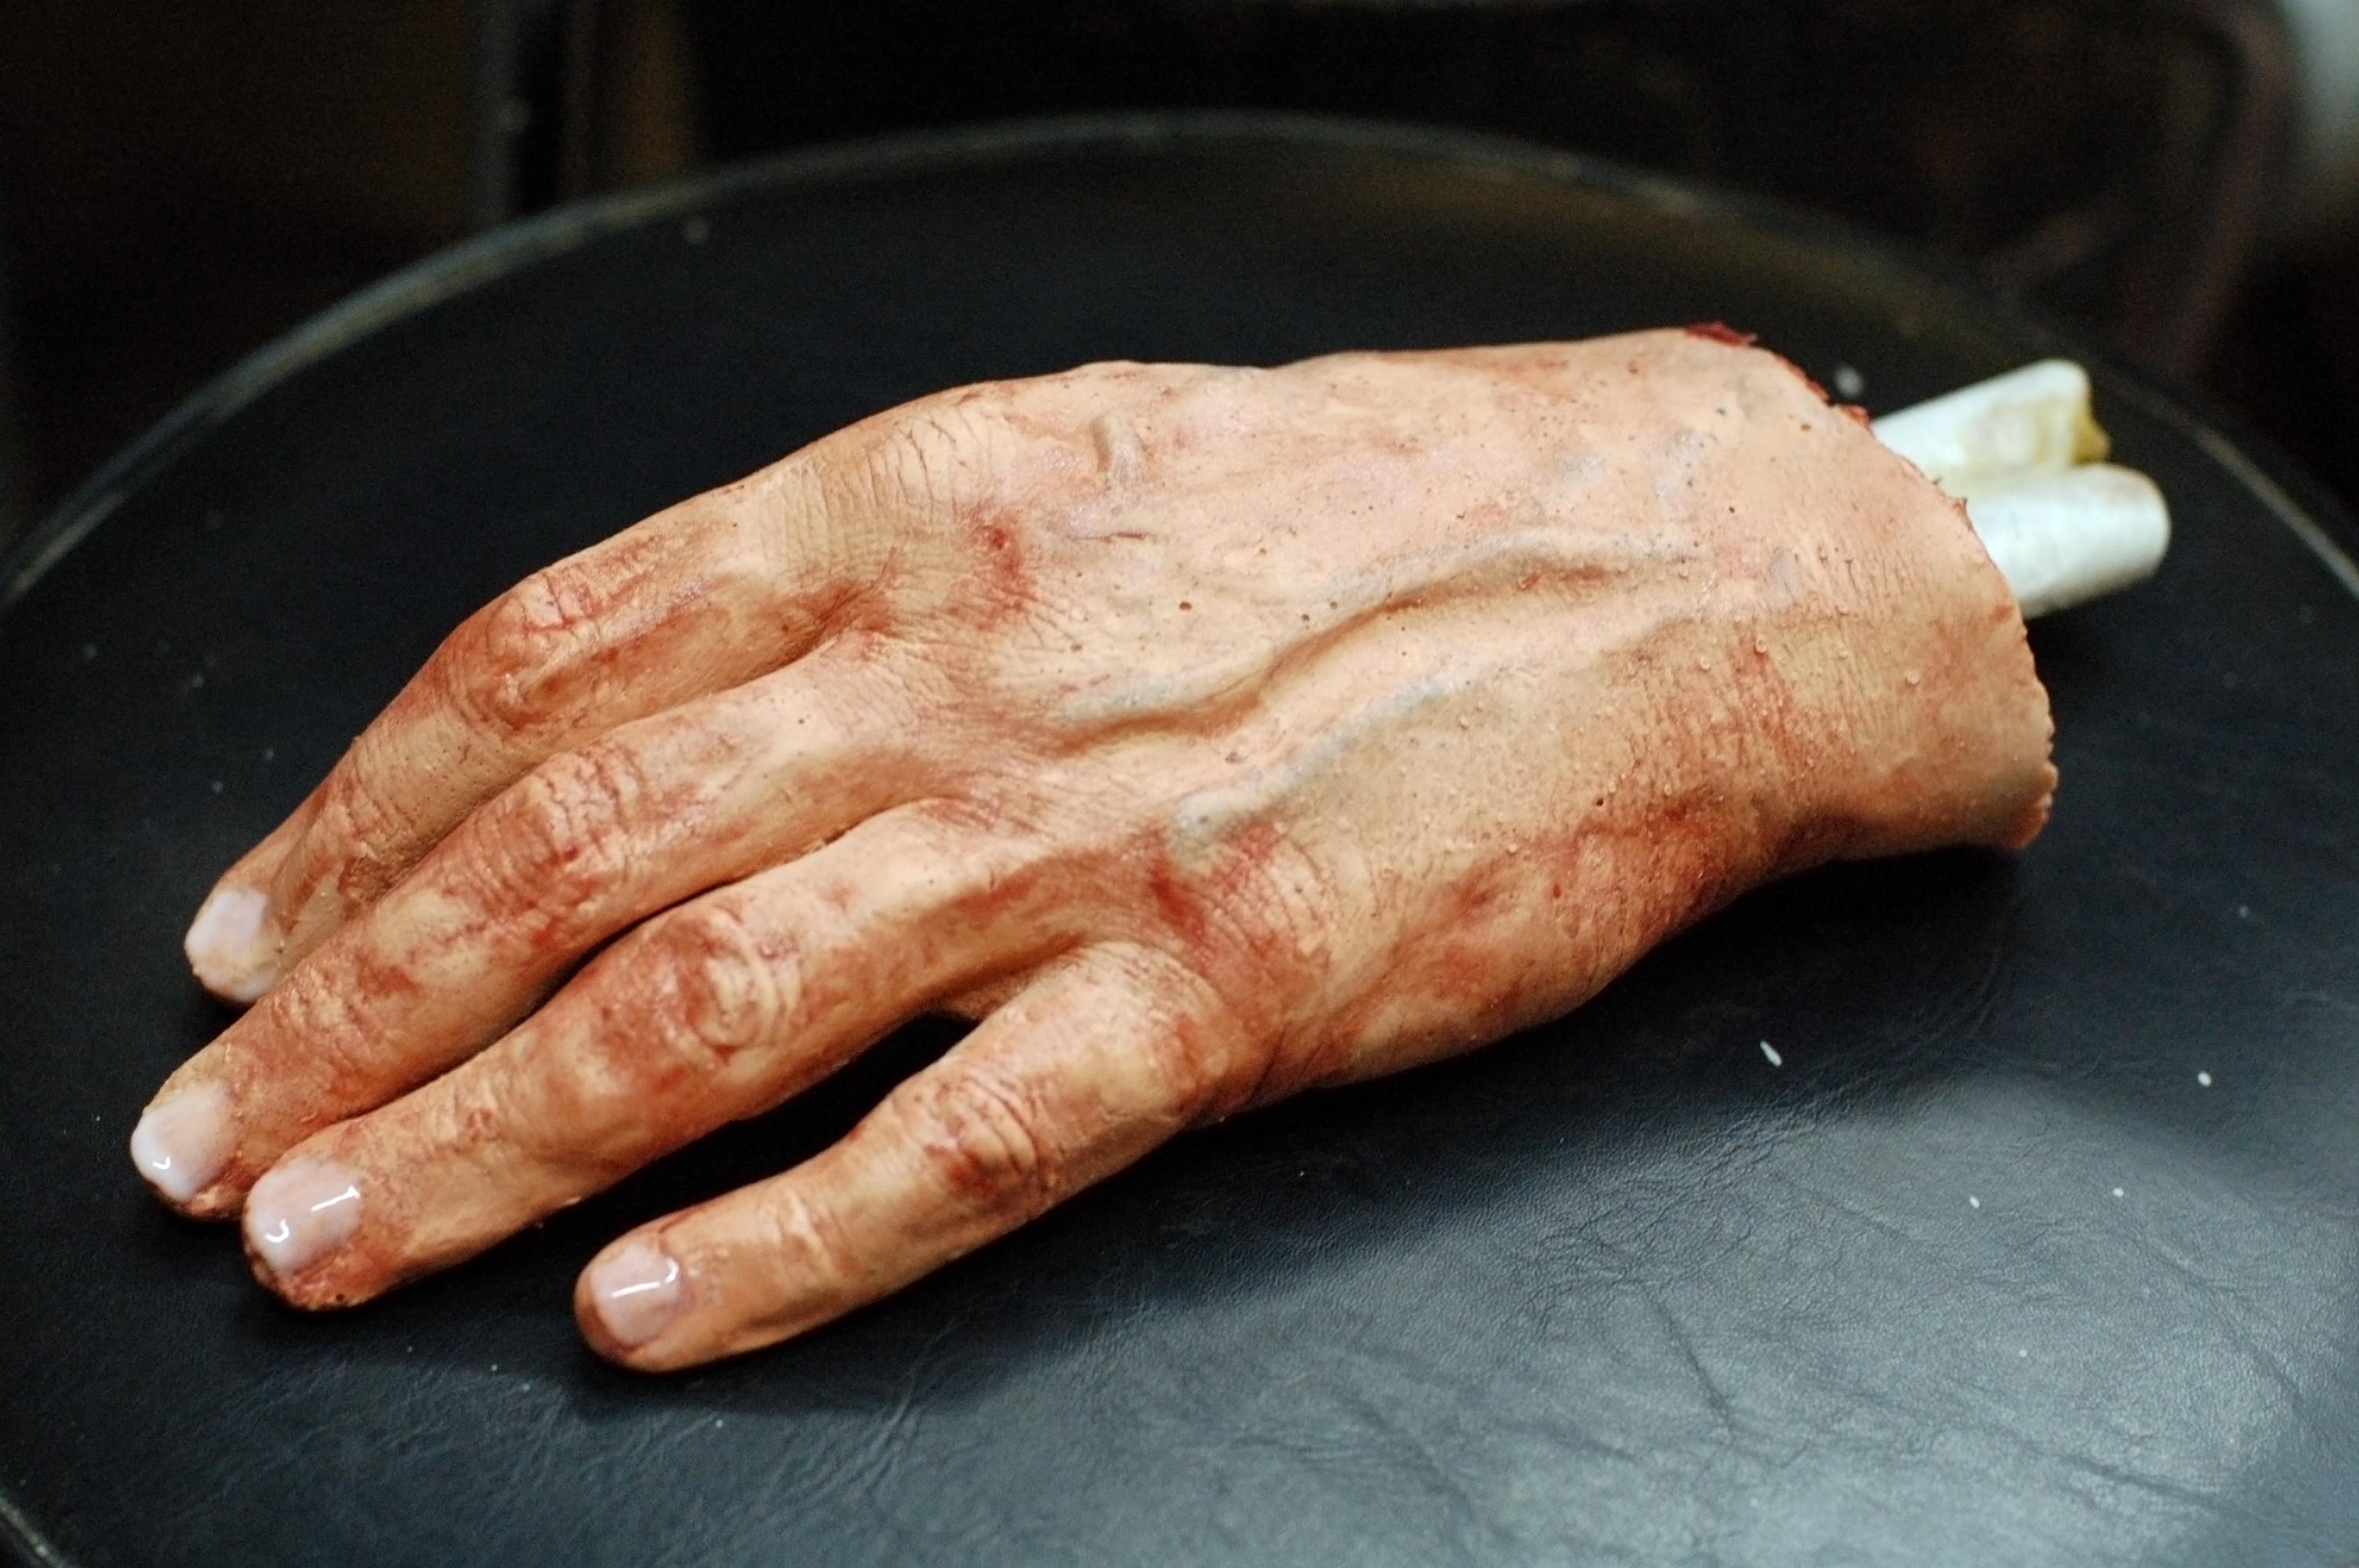 Titus hand